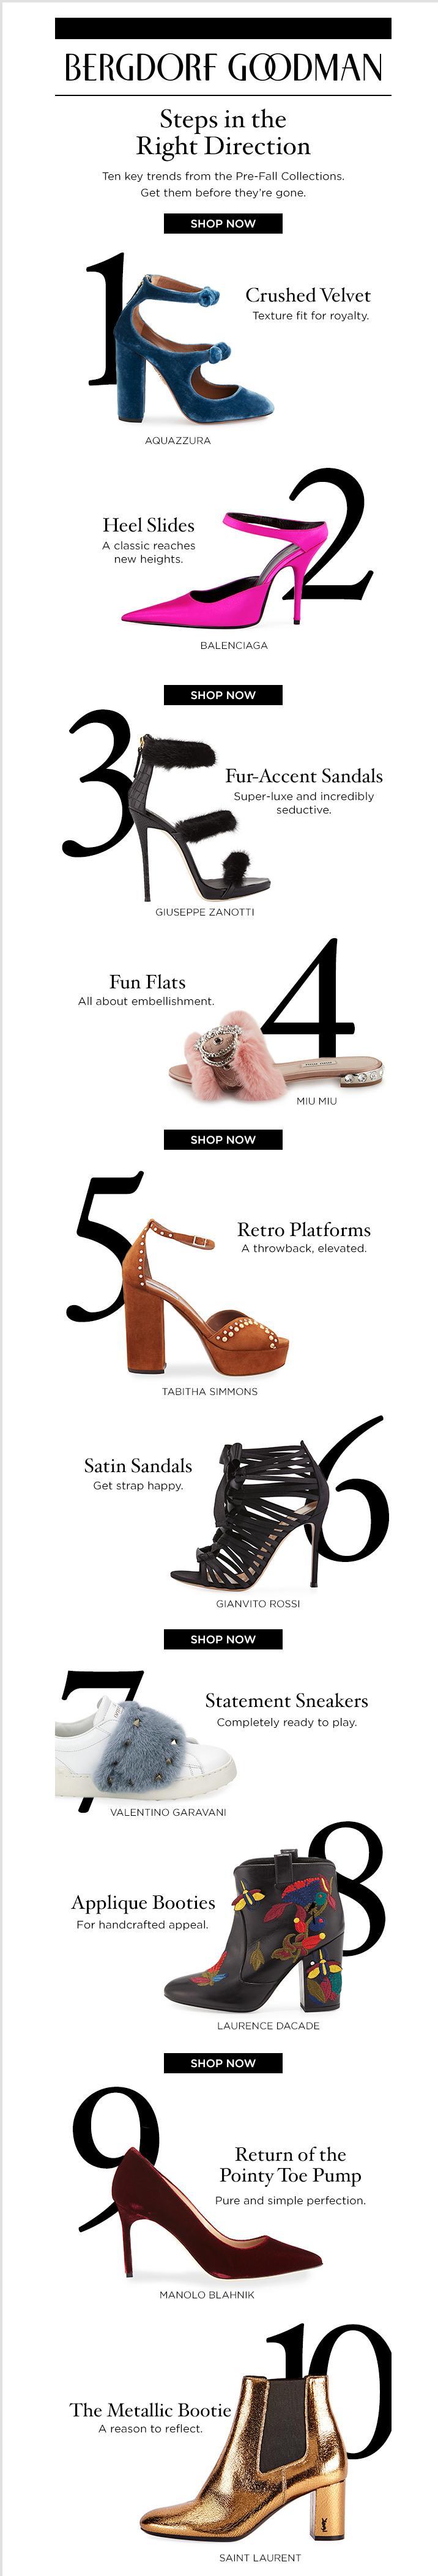 Bergdorf Goodman- Ten must-have shoes - Milled.jpg